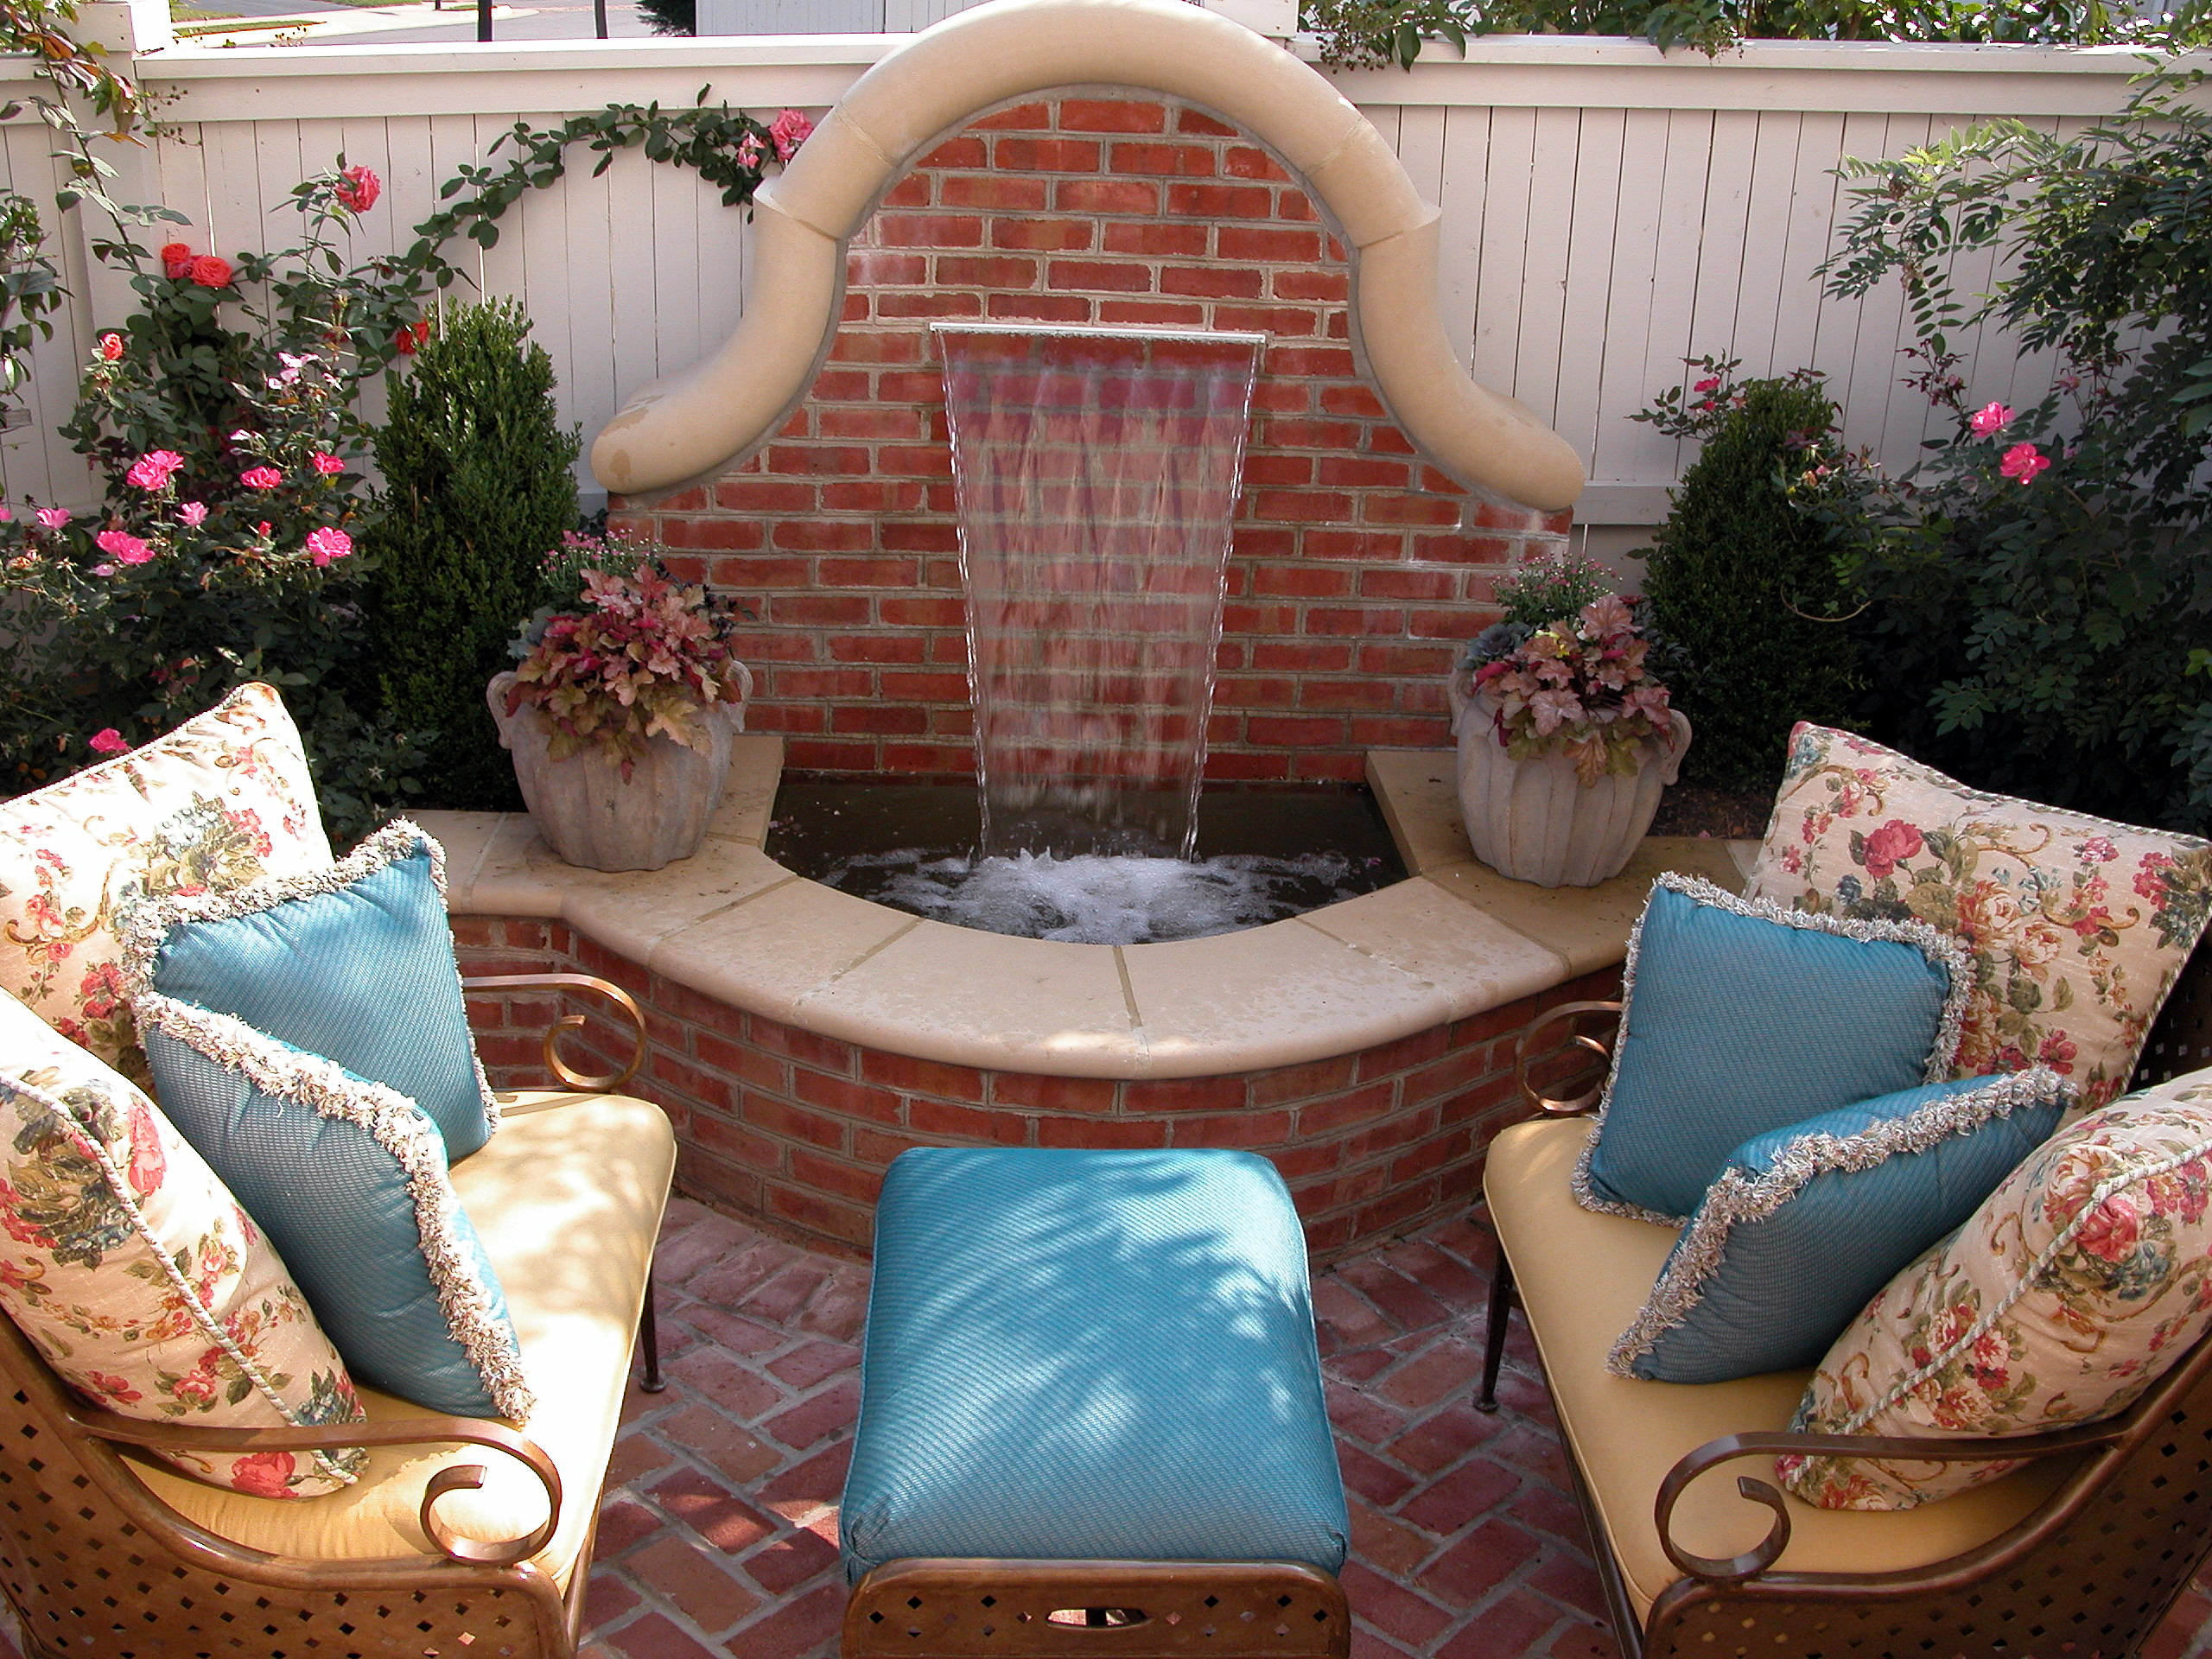 Brick Fountain on Patio